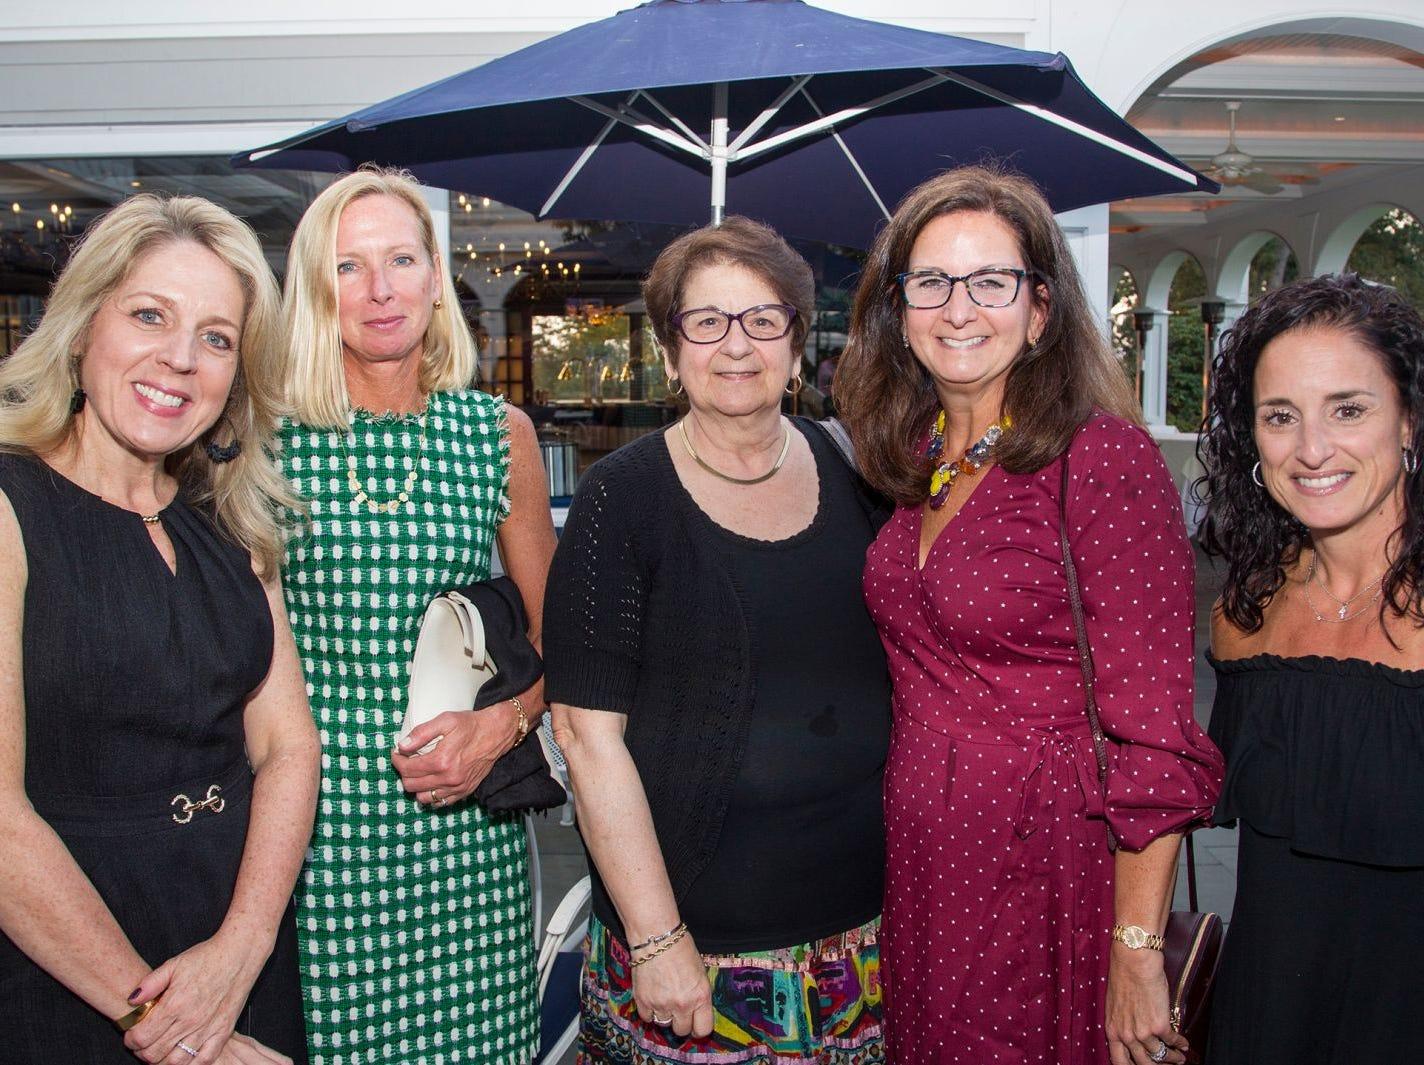 Maria Bushman, Cathy Visneron, Marsha Allen, Joanne Salerno, Alison Sharkey. Institute for Educational Achievement held its 23rd annual Golf Classic at Hackensack Golf Club in Oradell. 10/01/2018